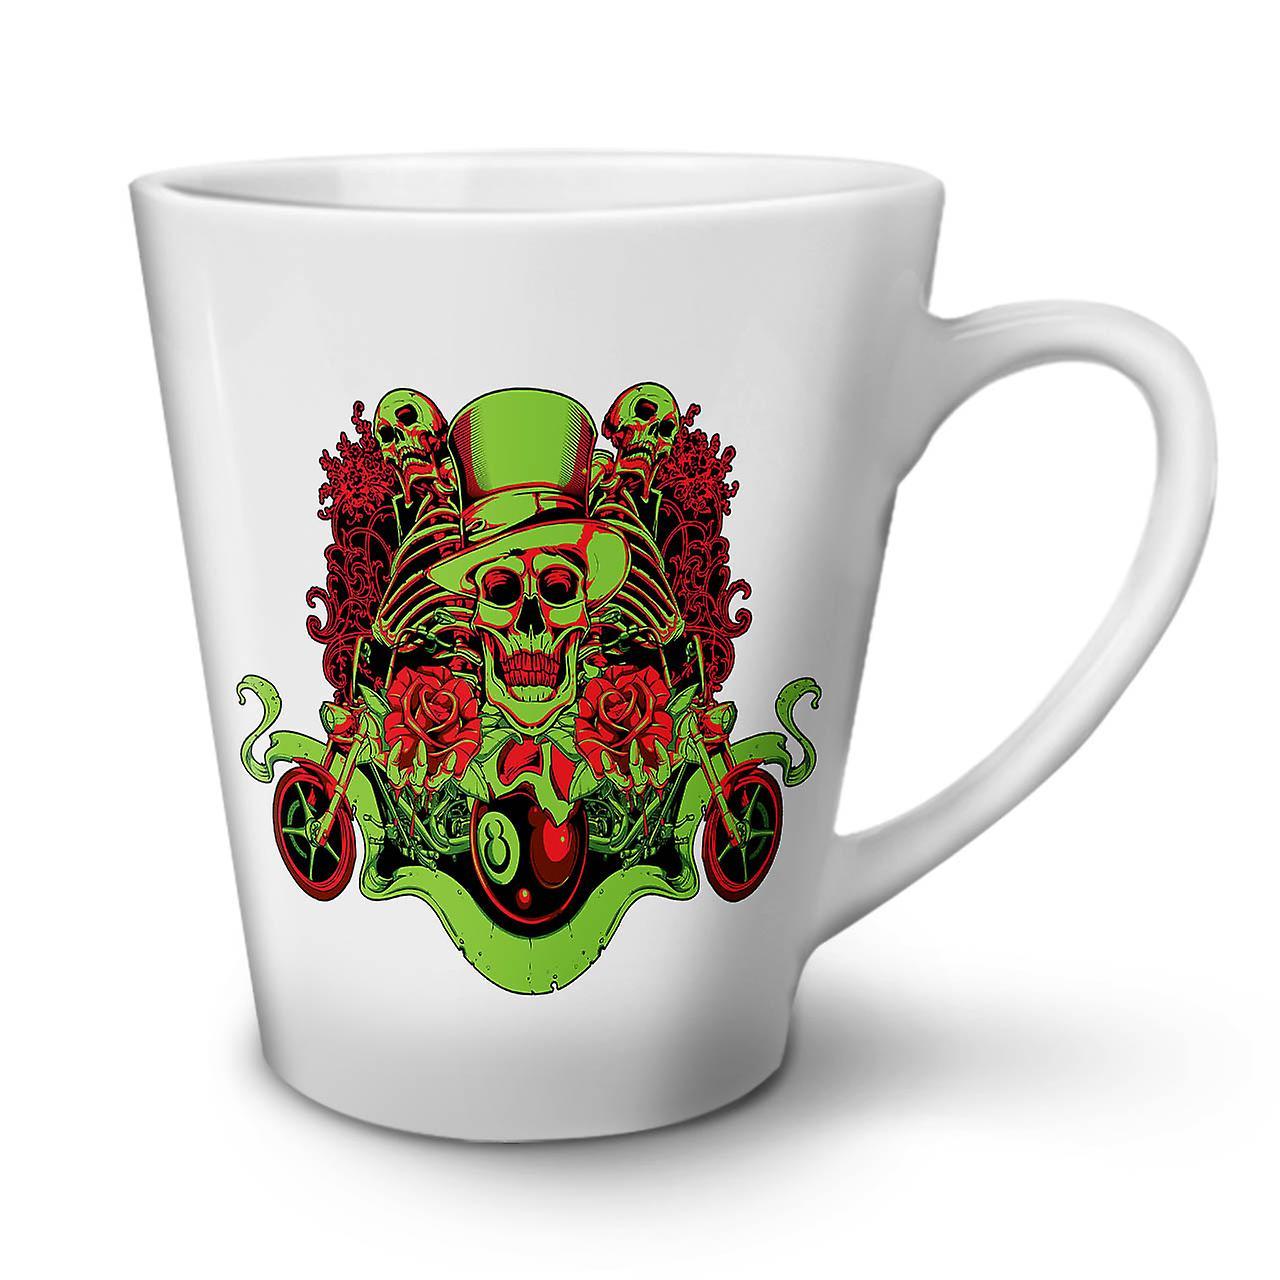 Mug Mort Céramique Café Clown Rose OzWellcoda Latte Thé 12 Nouveau Skull En Blanc Y6vbf7yg